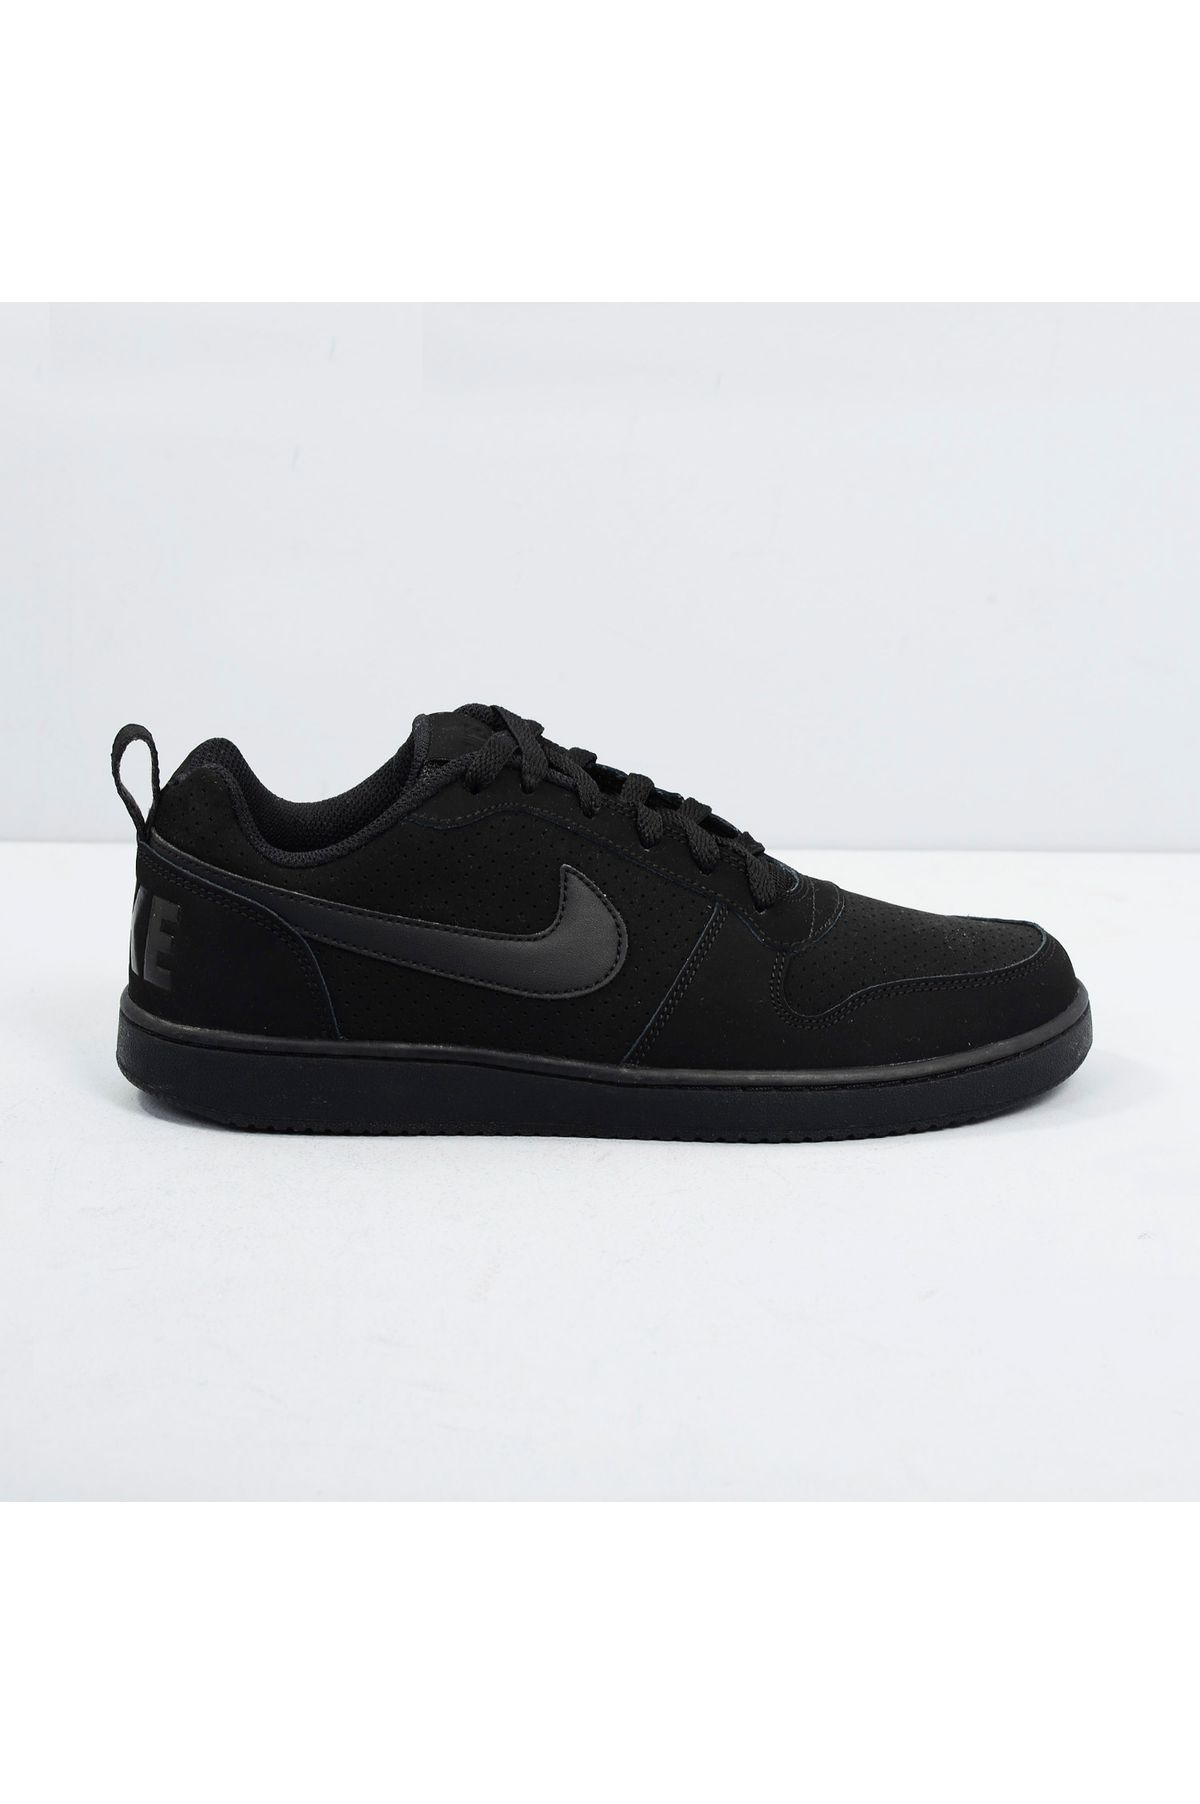 79b4d4d6cb9 Tênis Nike Court Borough Low